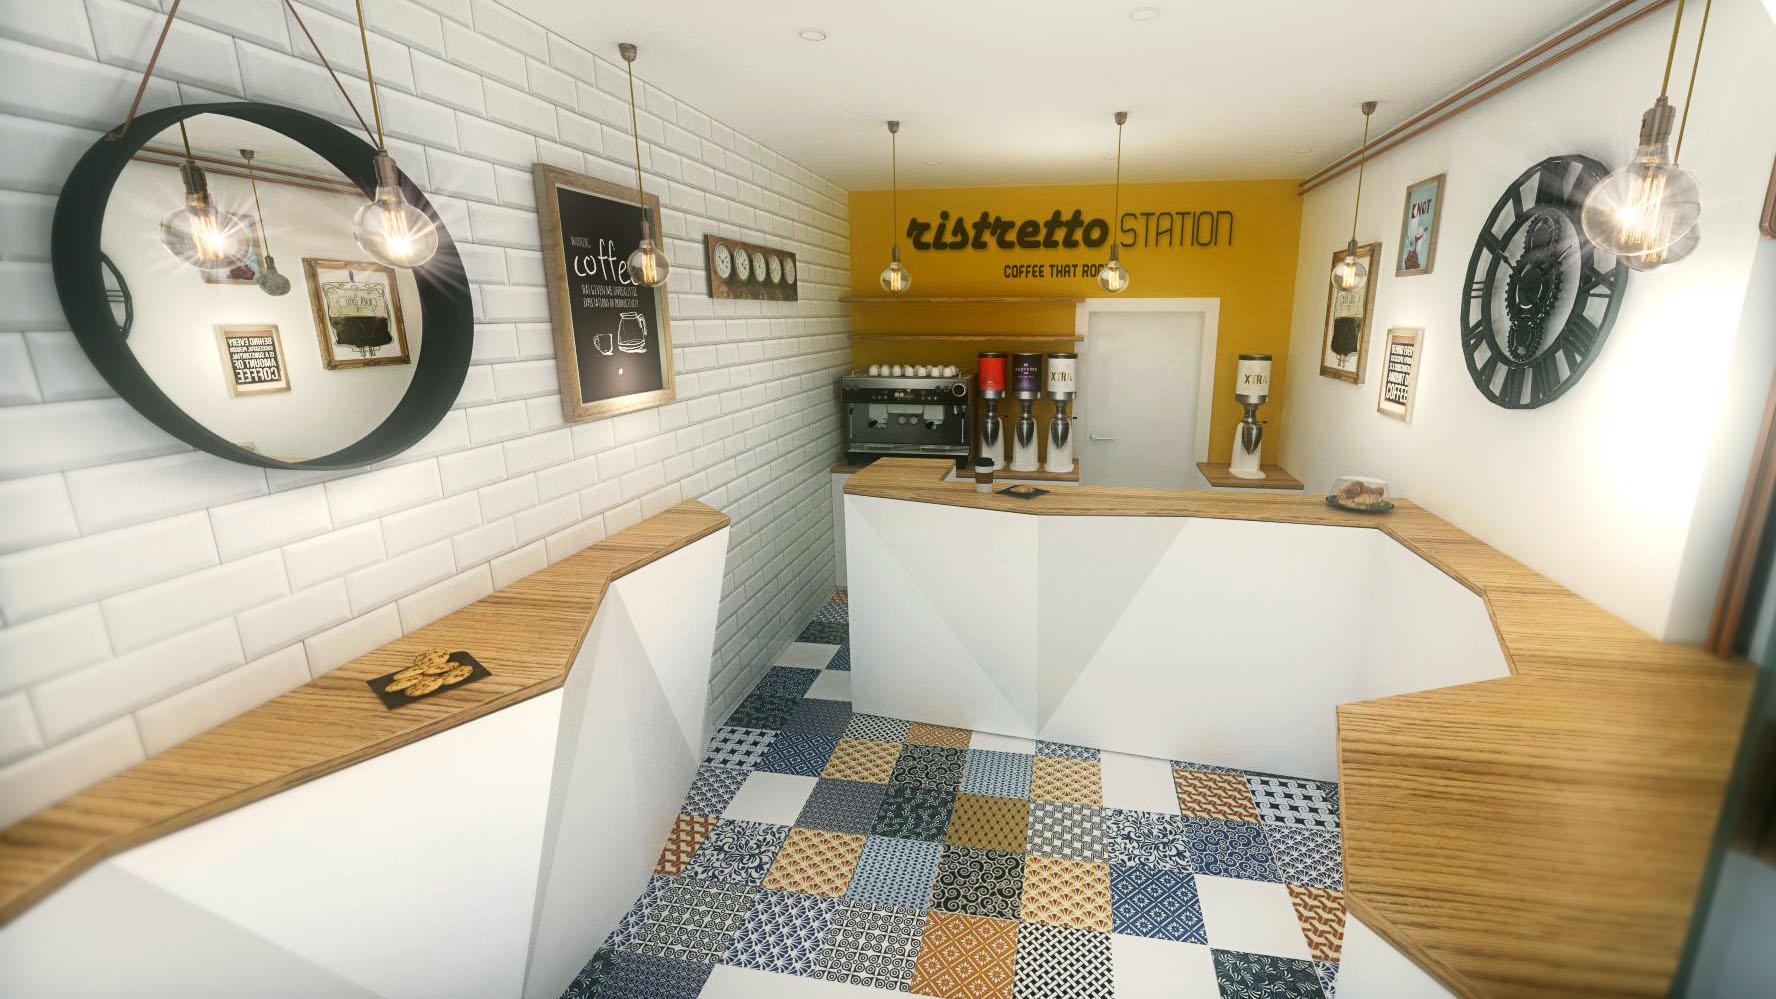 RISTRETTO STATION COFFEE SHOP 1